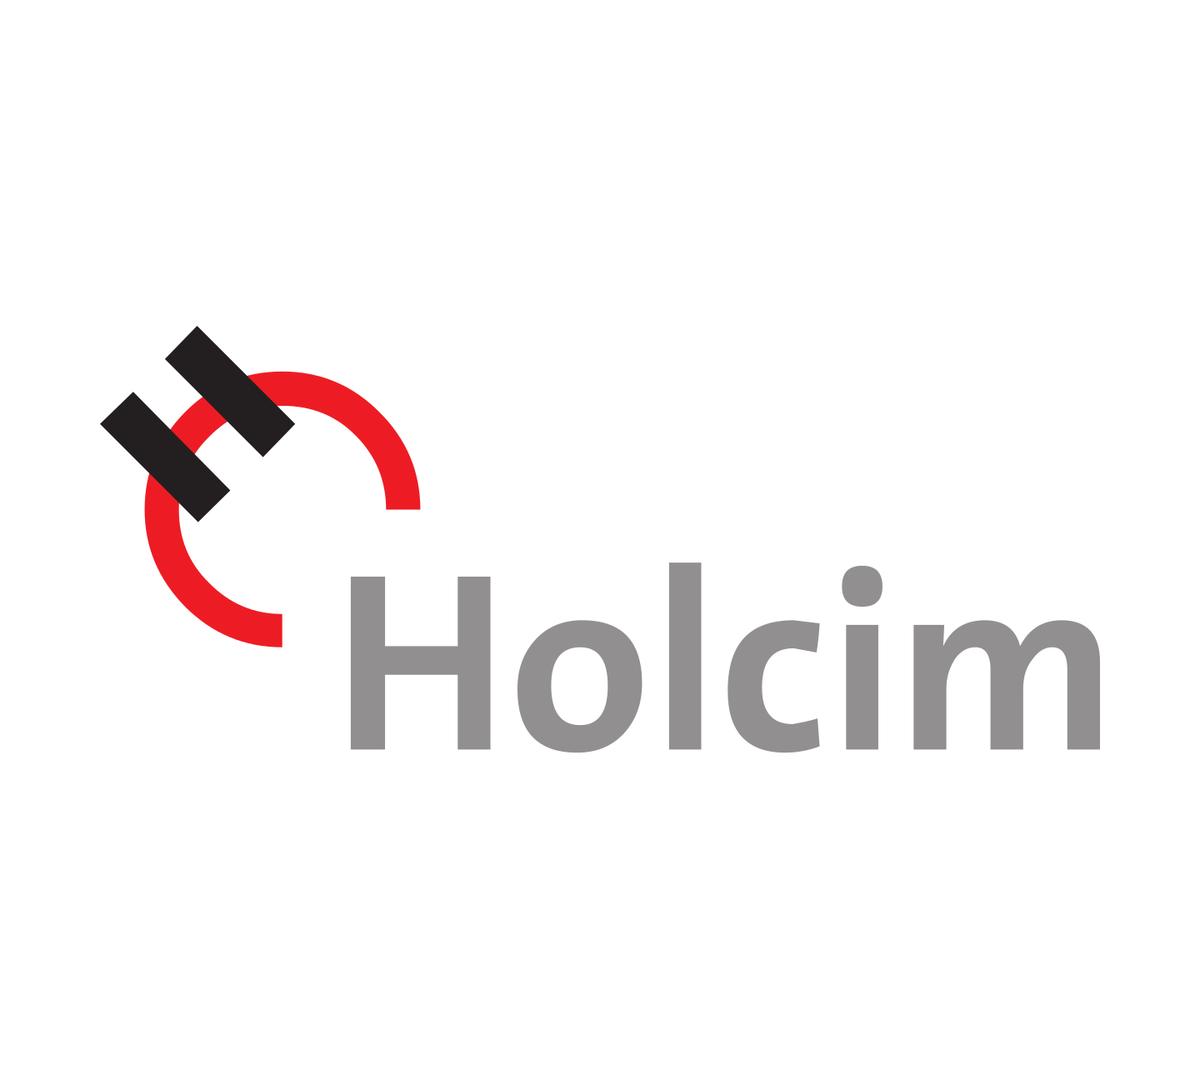 Holcim_logo.svg.png